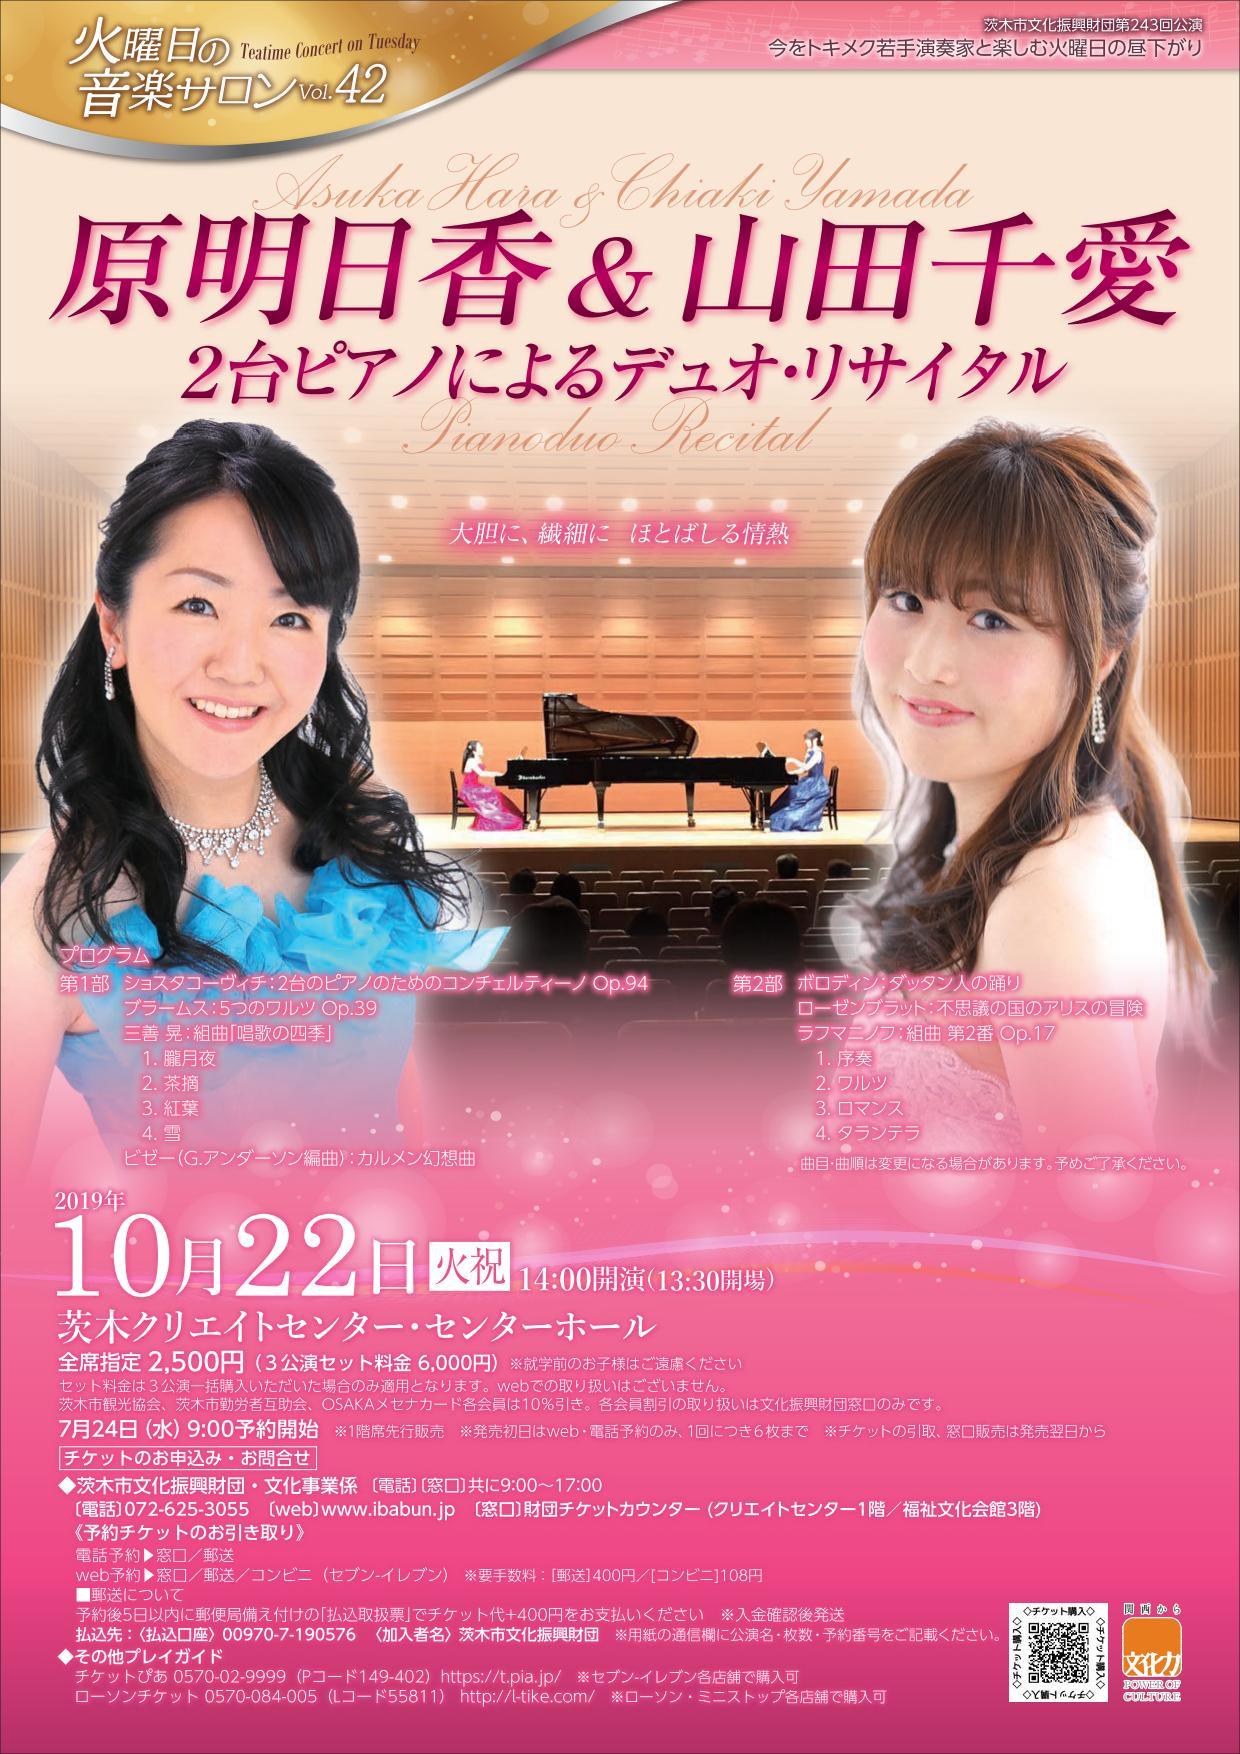 原明日香&山田千愛2台ピアノ